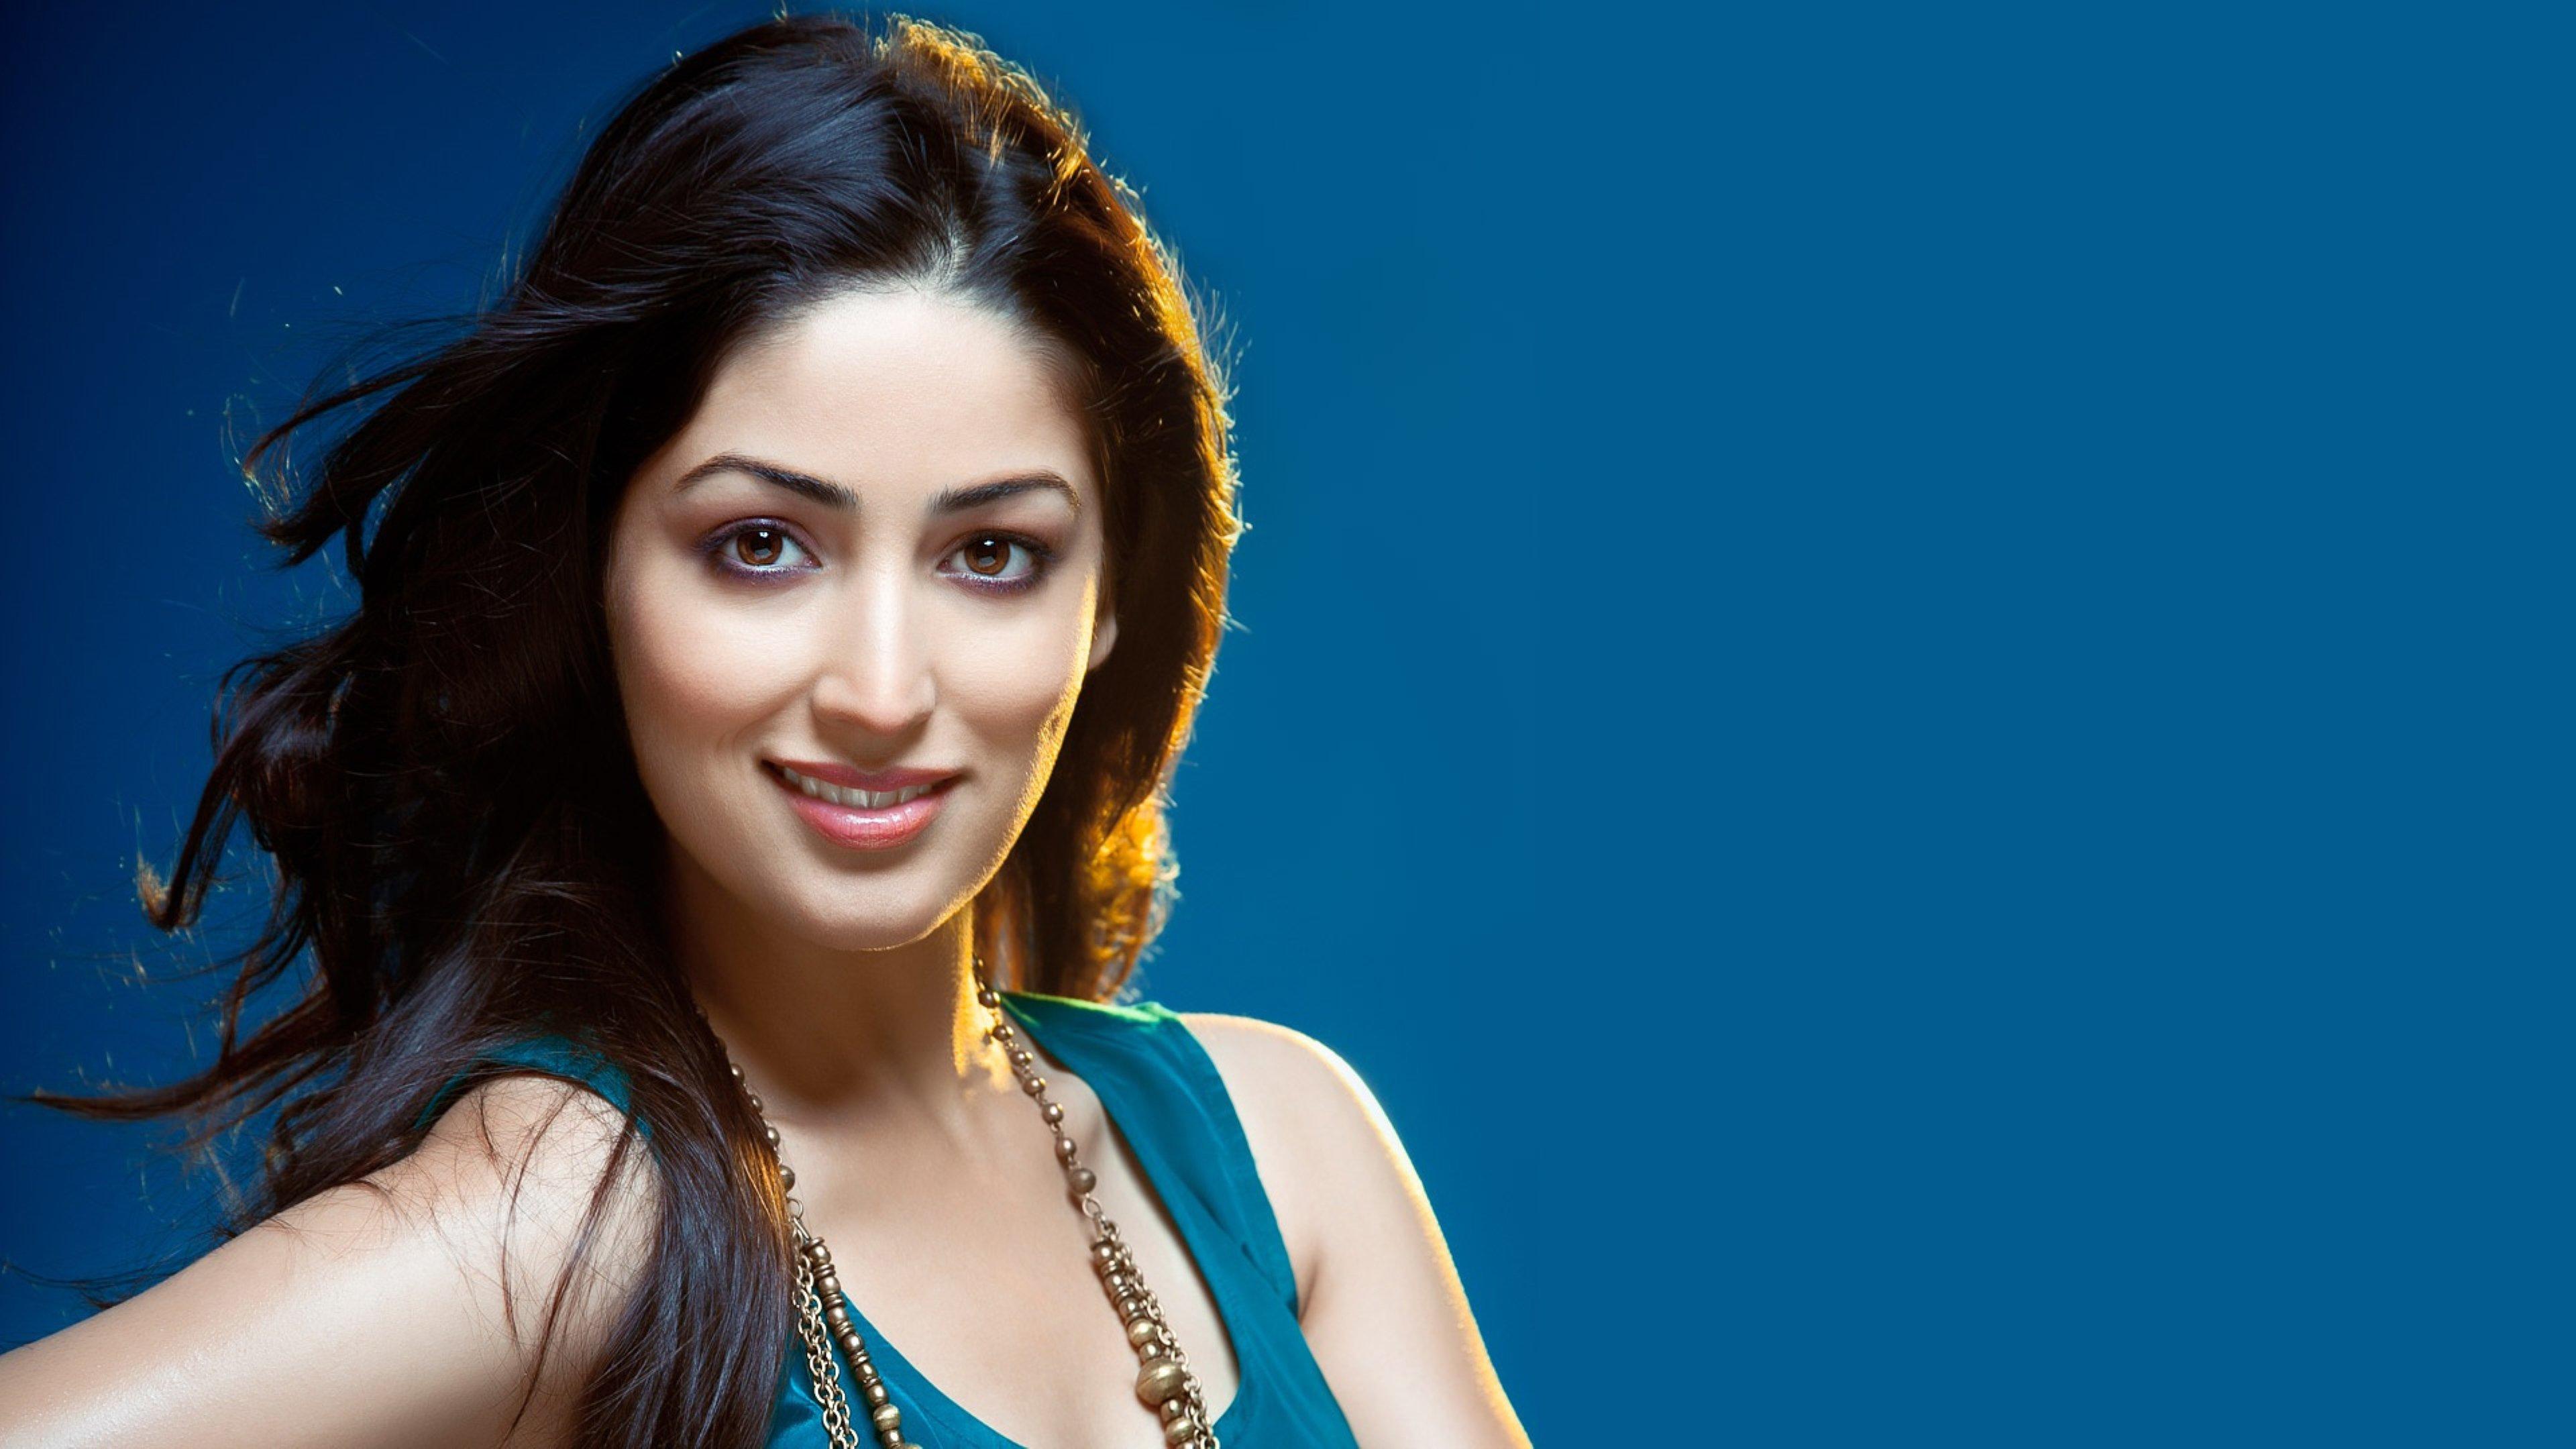 2932x2932 Pubg Android Game 4k Ipad Pro Retina Display Hd: Indian Actress 4K Ultra HD Beautiful Wallpapers 5 (1